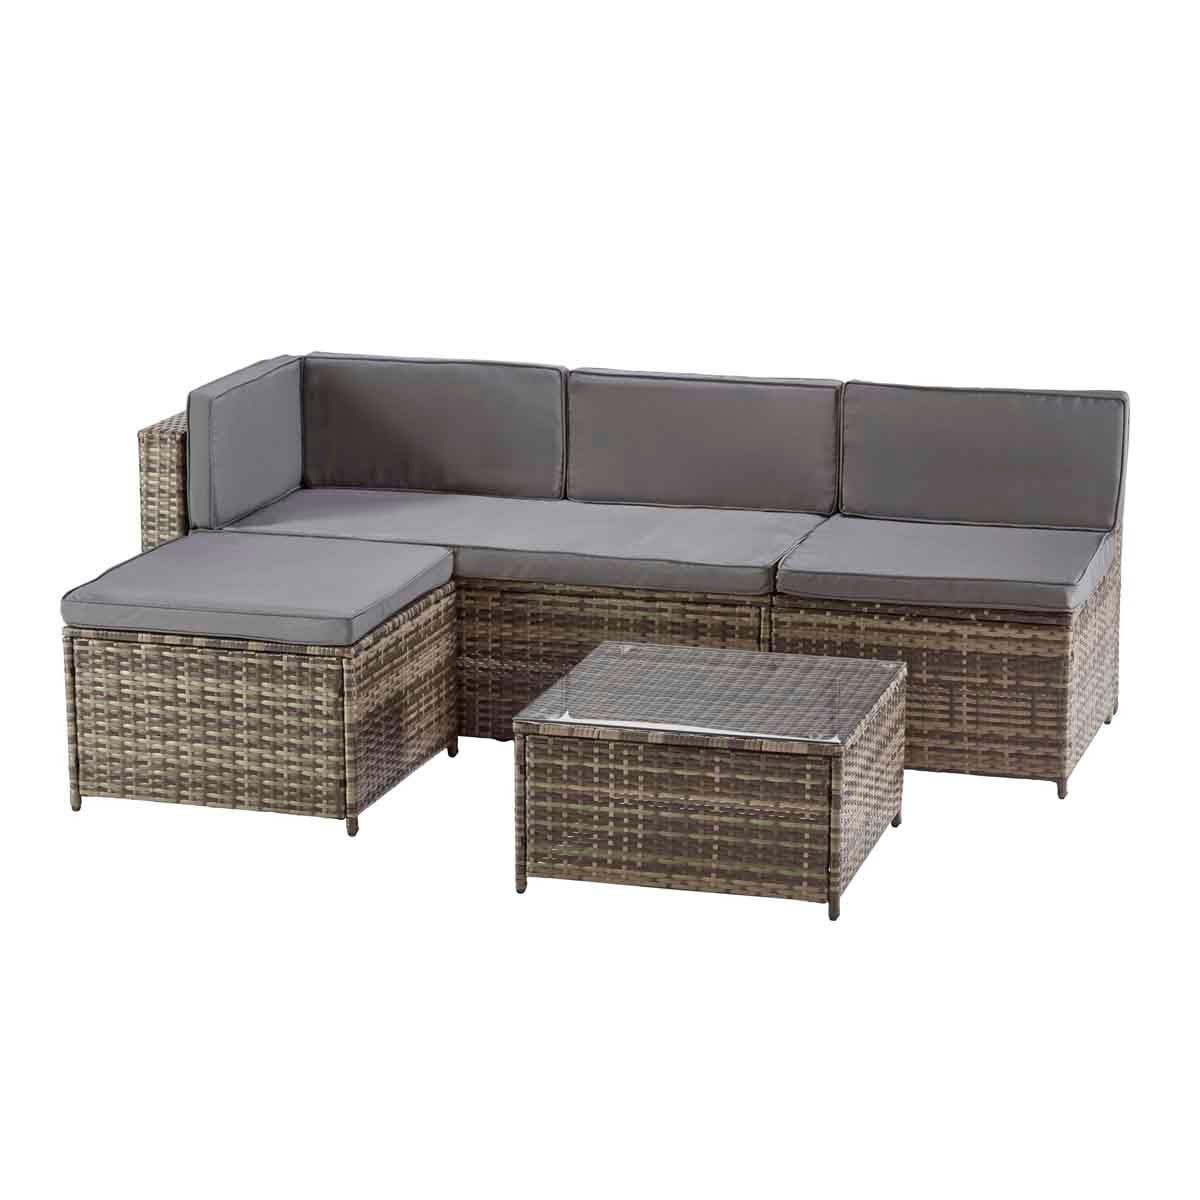 Garden Gear Milan Rattan Lounge Sofa Set with Cover - Dark Grey